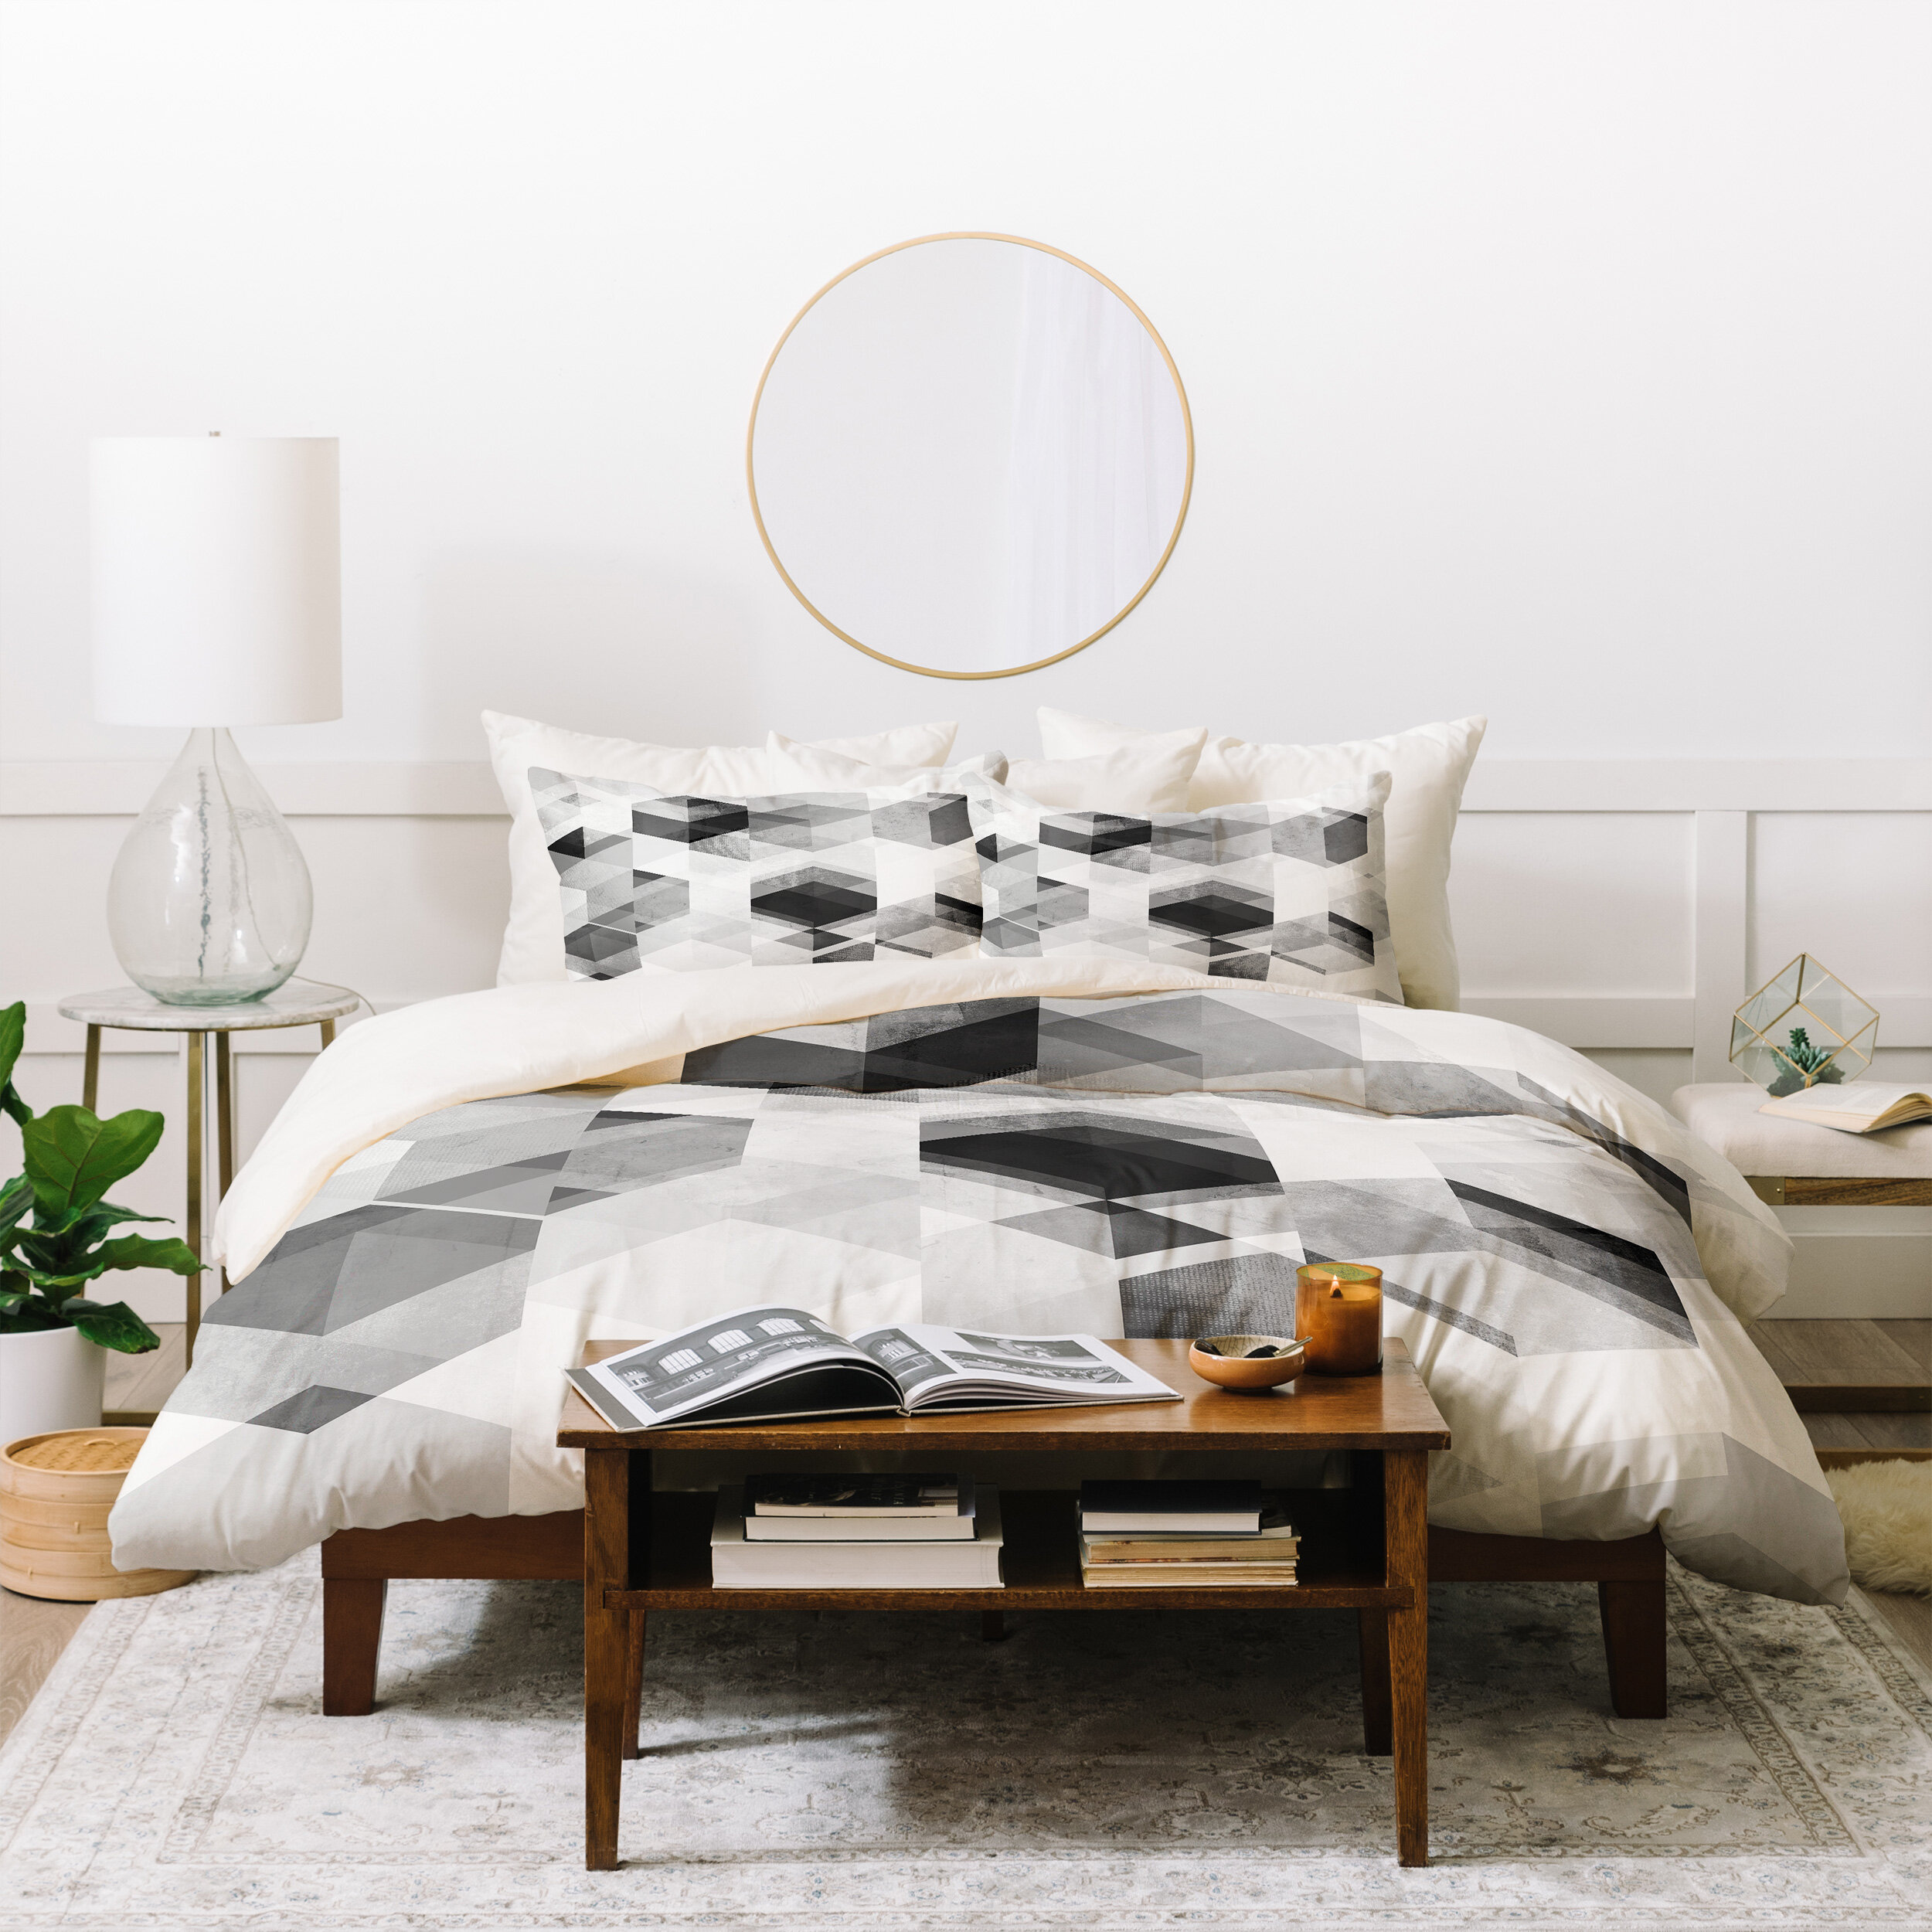 5 PC Luxury Soft Chelsea Duvet Cover Set 100/% Cotton Superior Single ply Woven